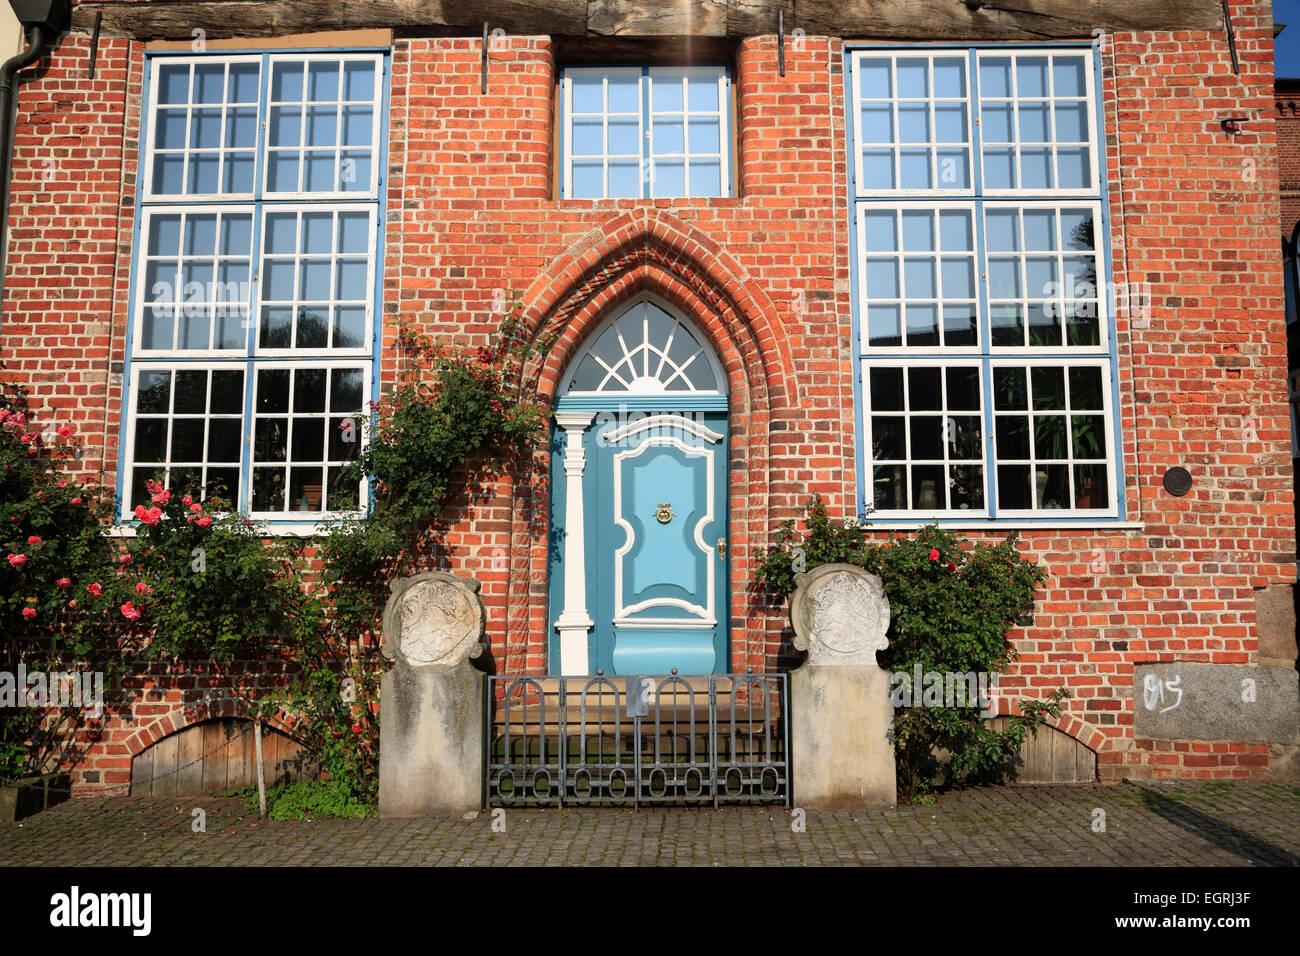 Casa antigua en Stintmarkt, Harbour trimestre, Lueneburg, Lüneburg, Baja Sajonia, Alemania, Europa Imagen De Stock